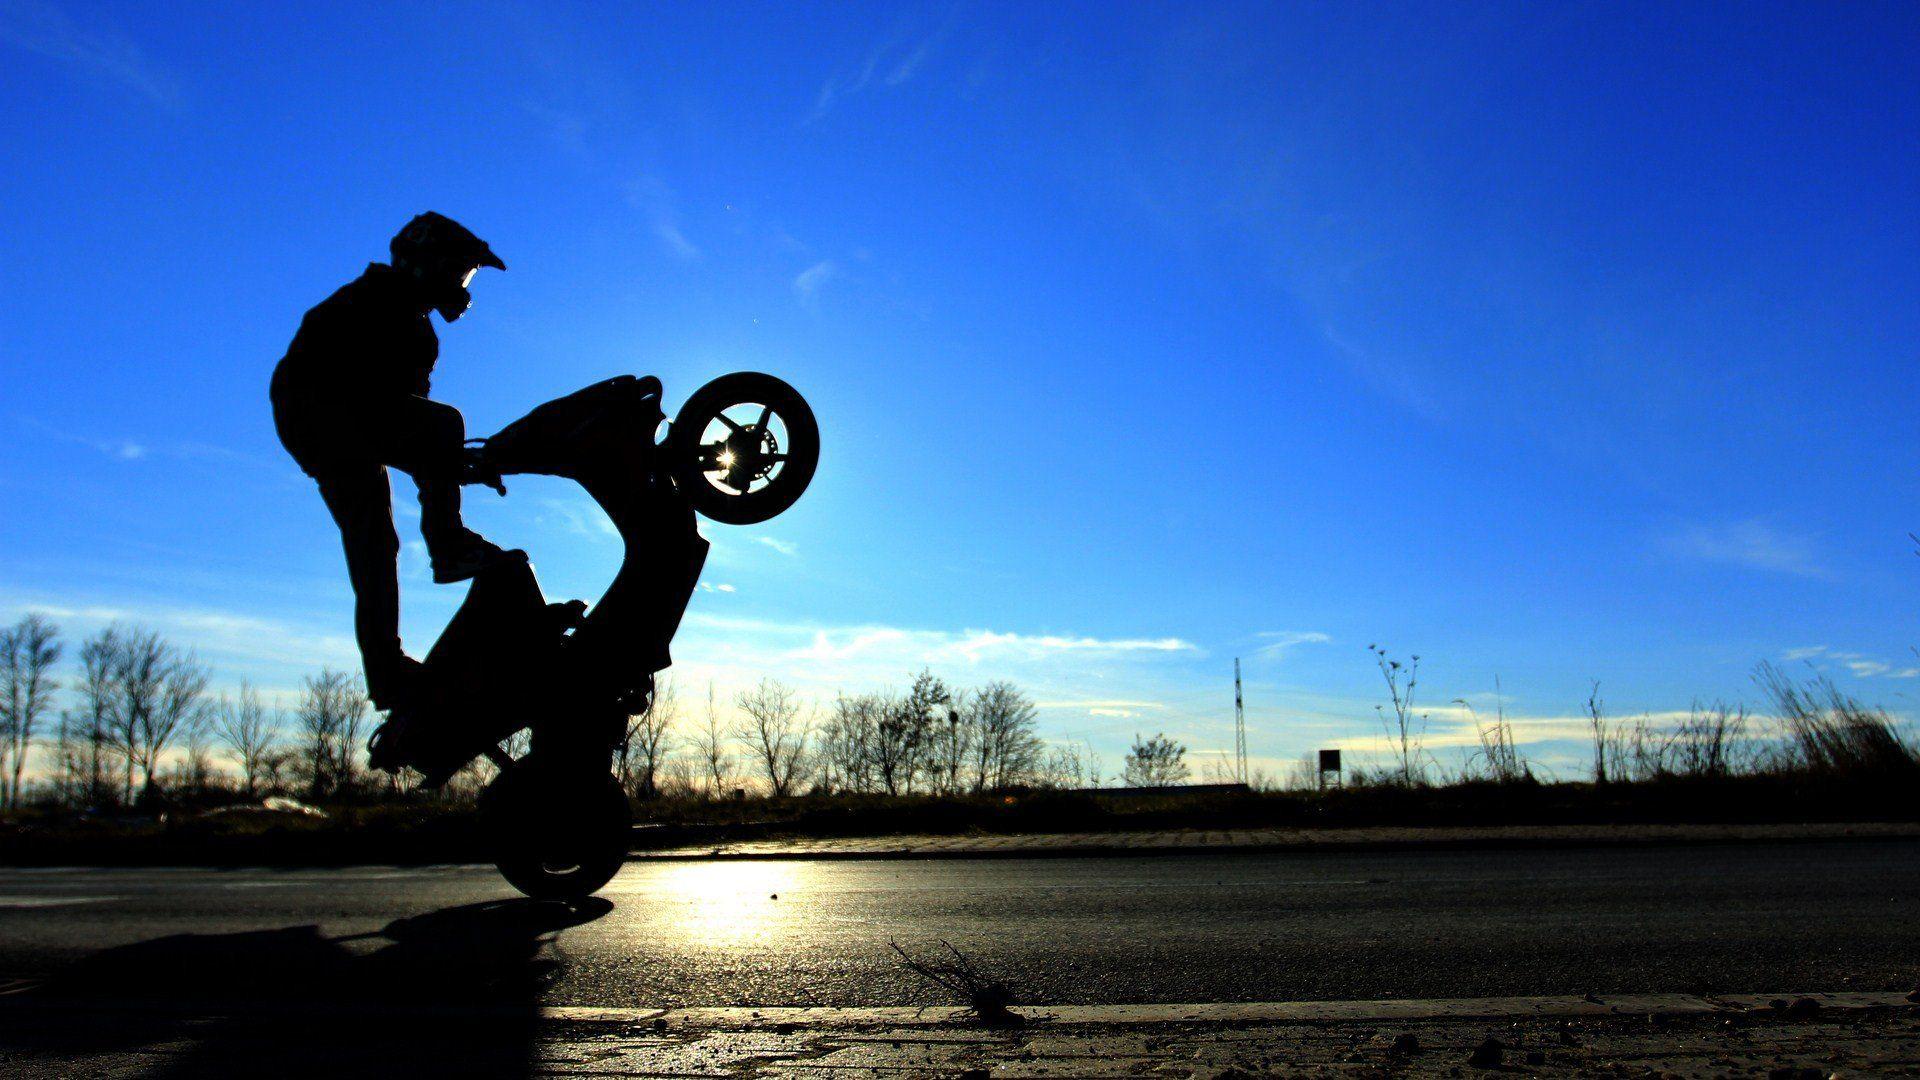 Motorbike Stunt Wallpaper Images